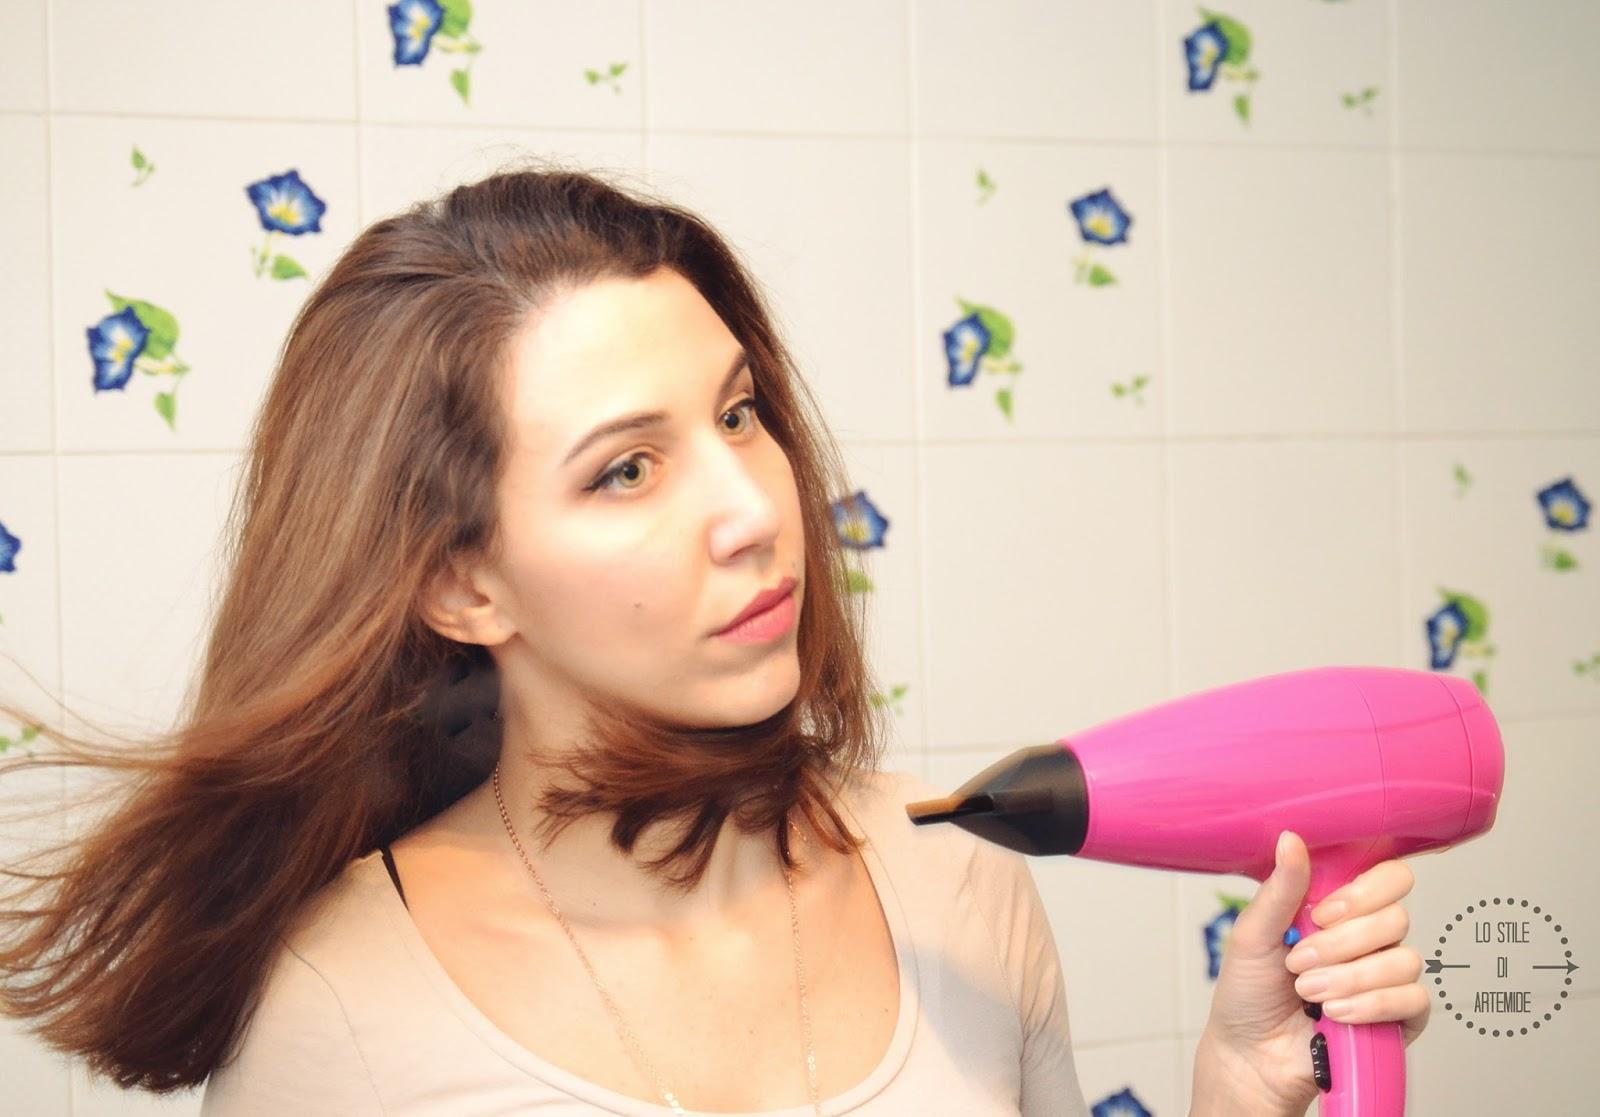 Uki casanova l 39 asciugacapelli professionale alla moda - Casanova casalinghi ...